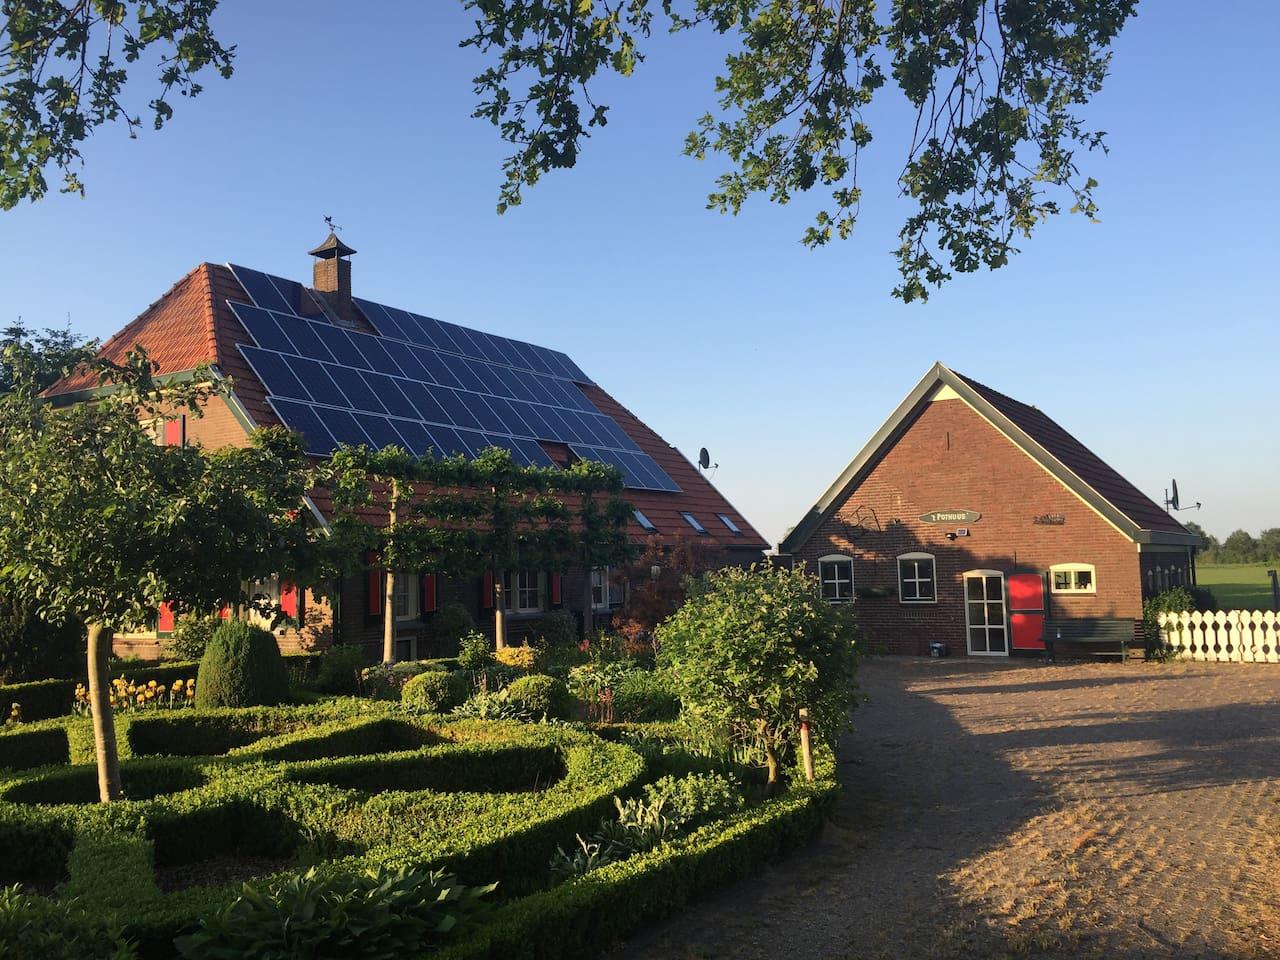 Boerderij met bijgebouw Farmhouse with seperate house Landwirt Ferien Wohnung